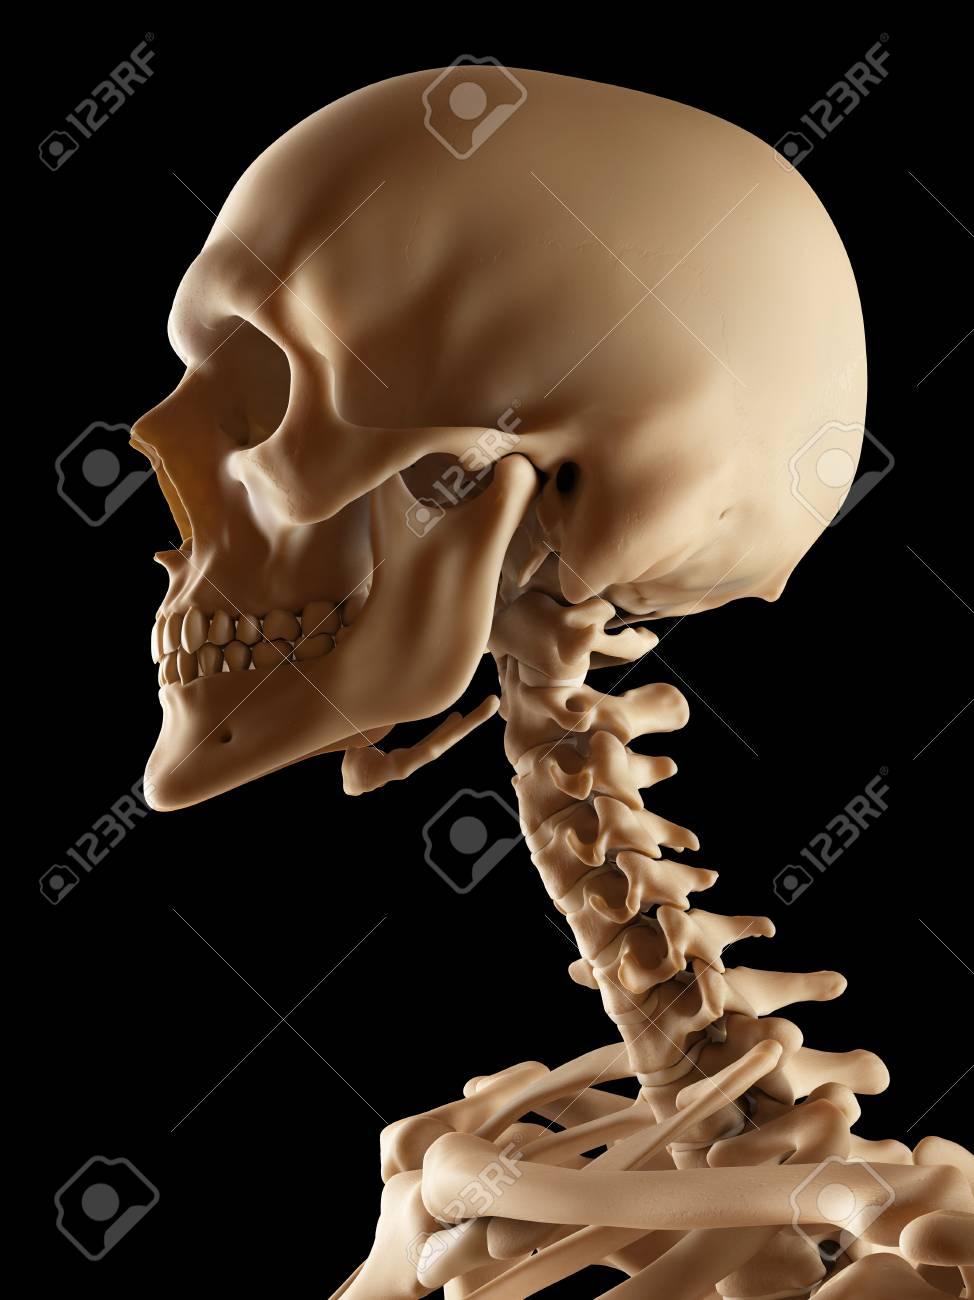 Human skull and neck bones illustration stock photo picture and human skull and neck bones illustration stock photo 77547778 ccuart Choice Image